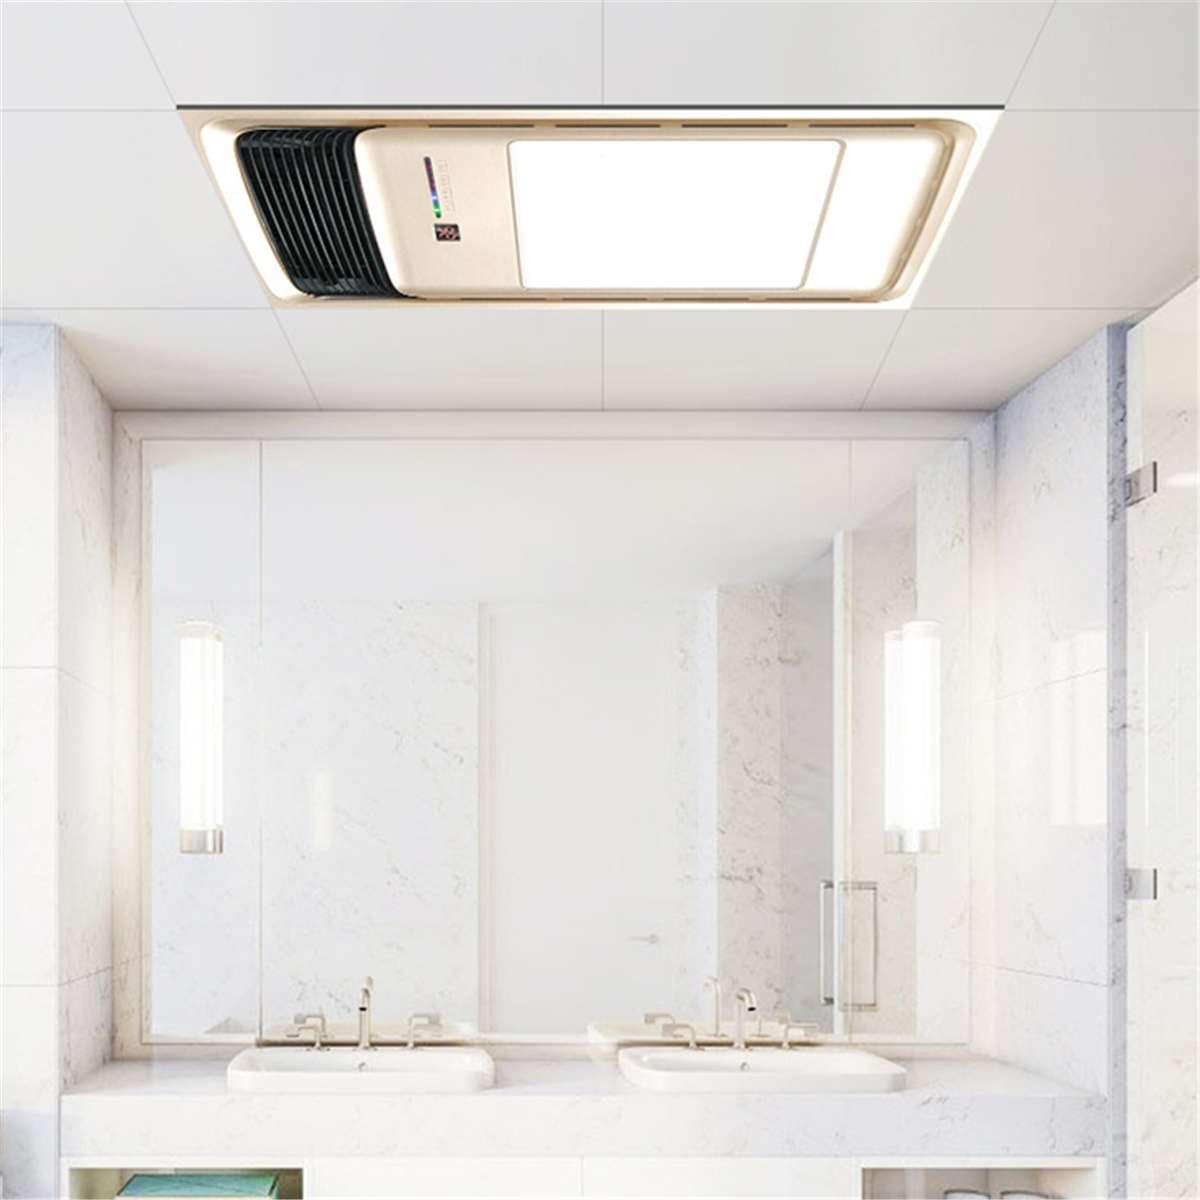 220v Bathroom Electric Heater Exhaust Fan Warmer Ceiling Lights Heating Winter Shower Livingroom